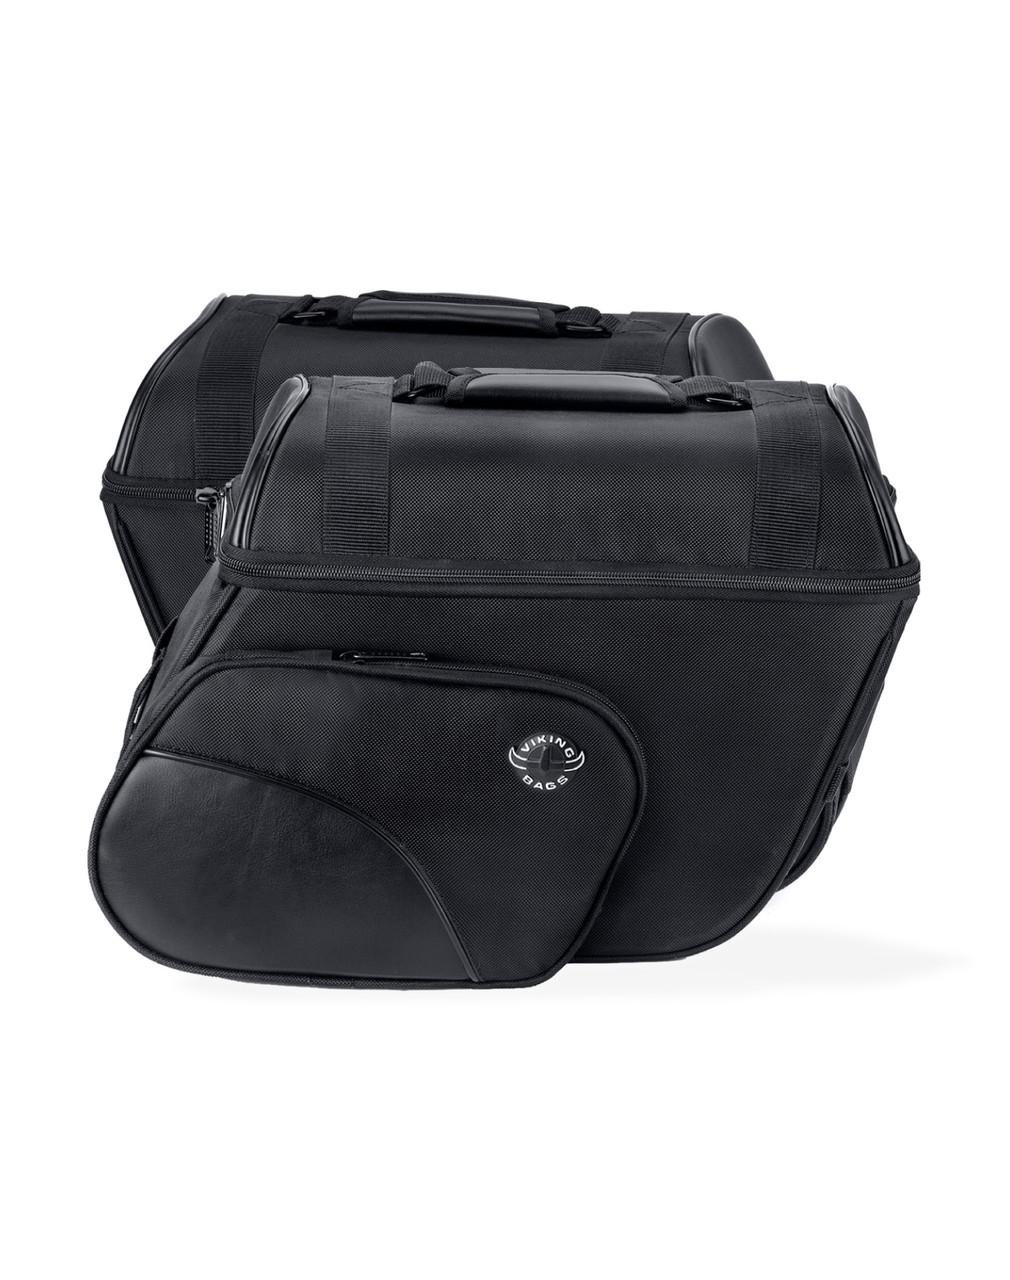 Victory Judge Slanted Medium Motorcycle Saddlebags Both Bags View